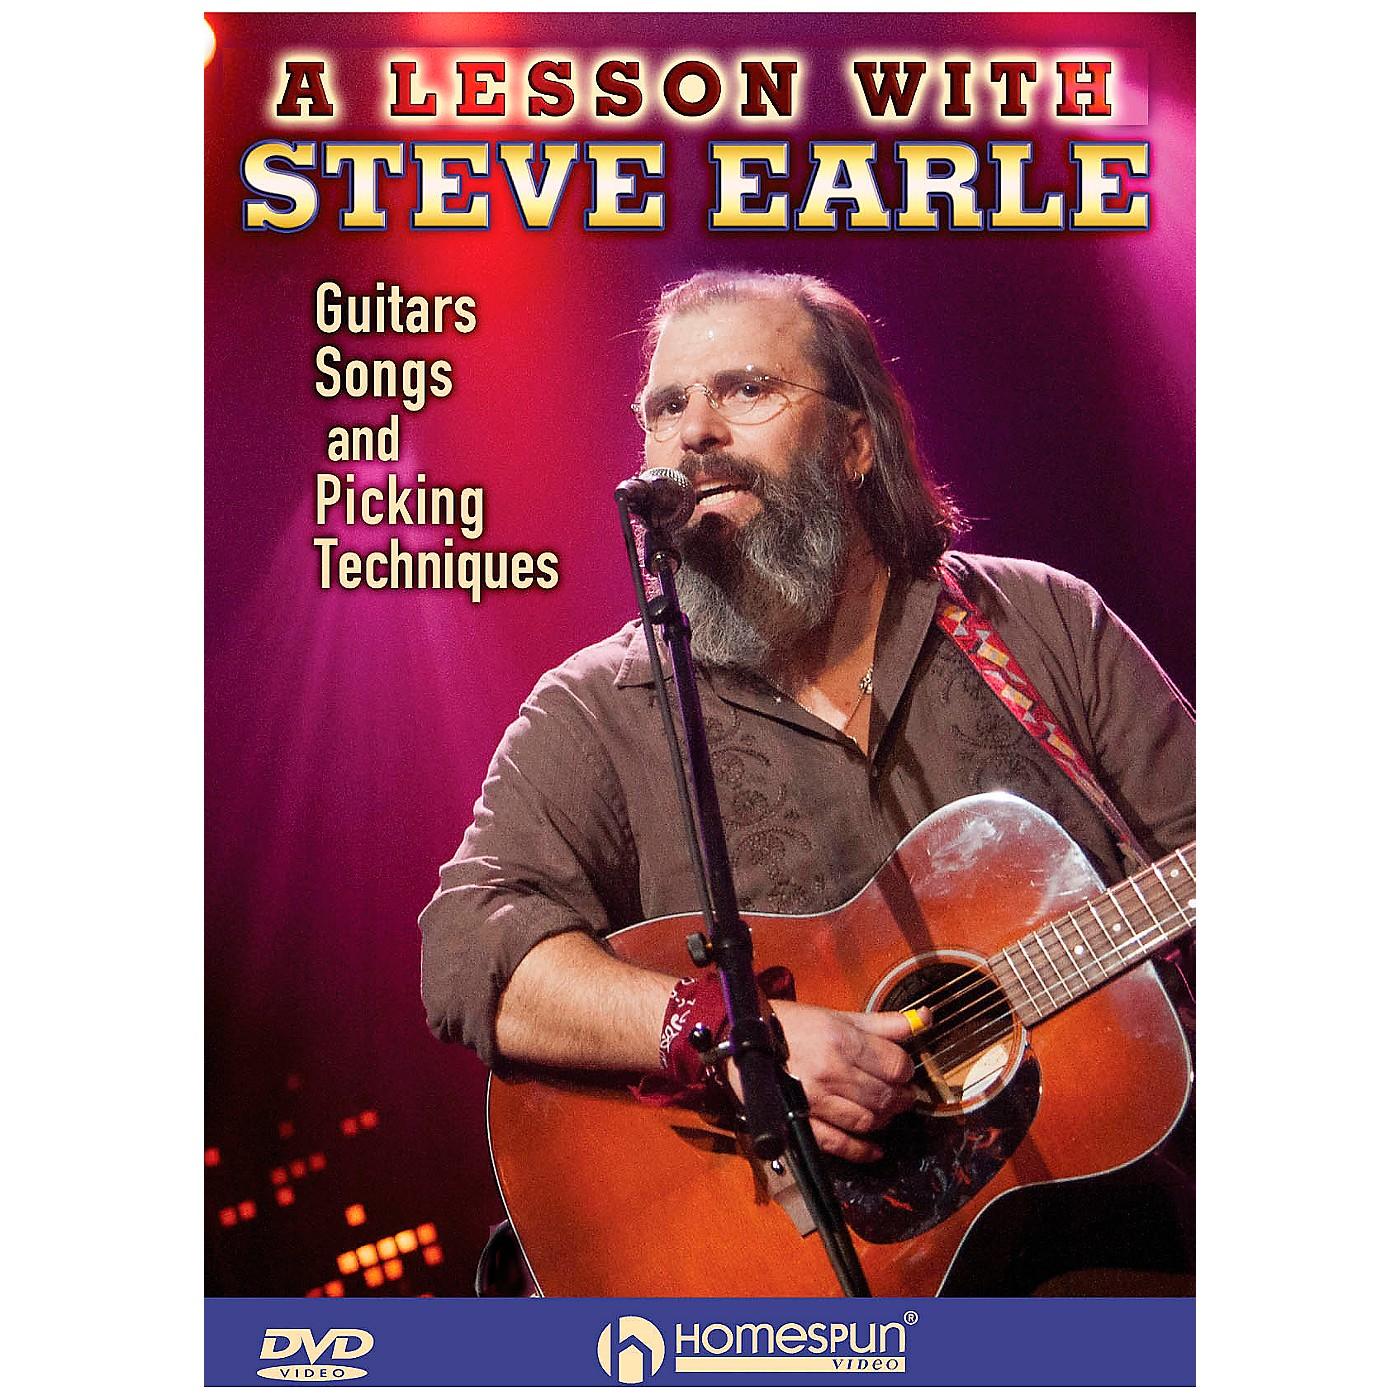 Homespun Steve Earle - Guitars, Songs, Picking Techniques And Arrangements DVD thumbnail